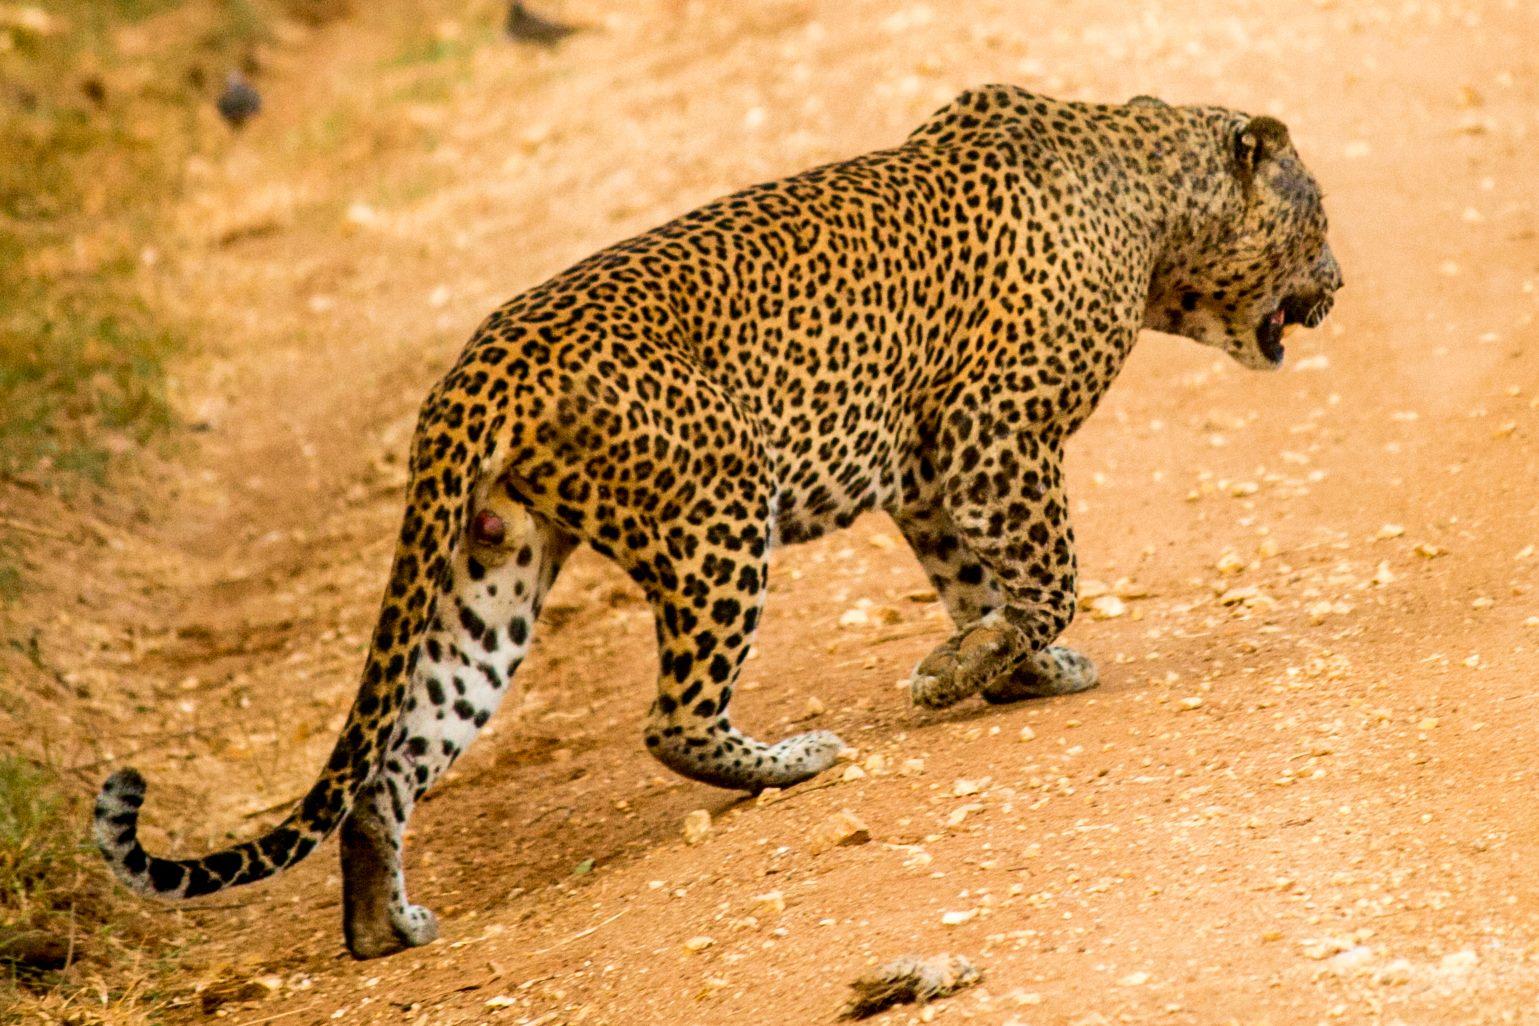 invite-to-paradise-sri-lanka-and-maldives-specialists-travel-agent-tour-operator-customer-review-feedback-joel-rhian-leopard-1.jpg